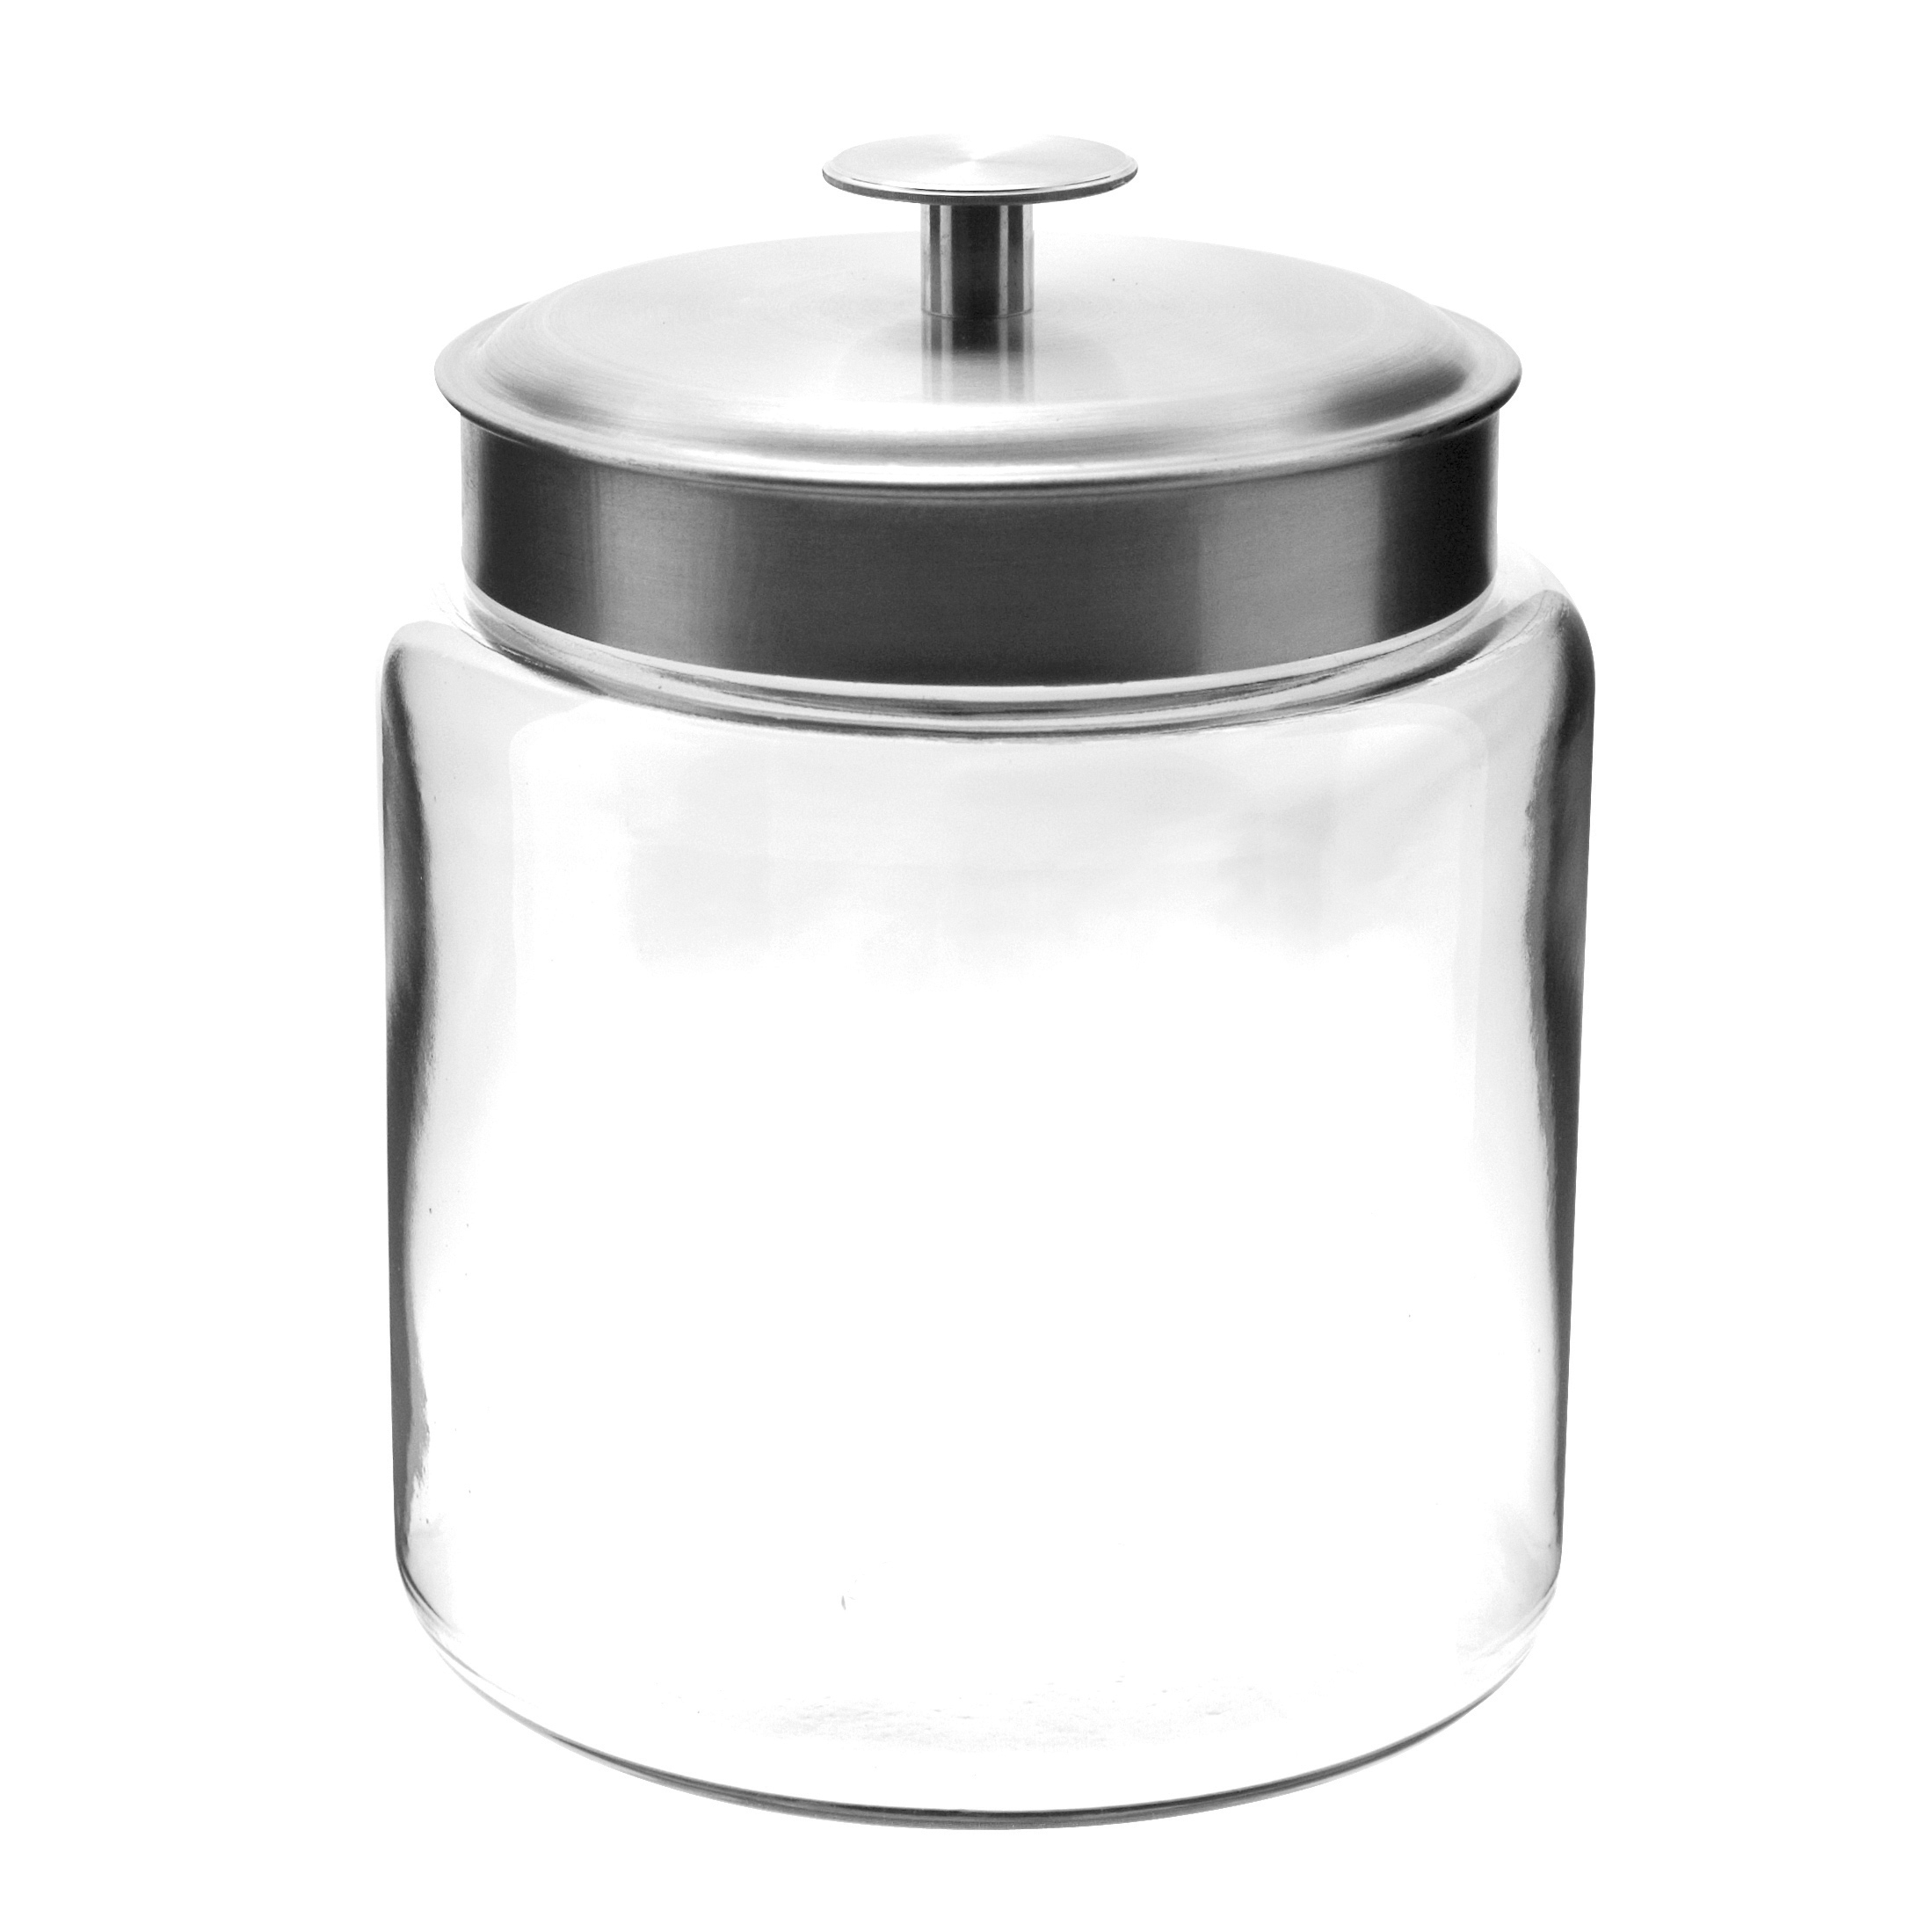 Anchor Hocking Foodservice 95539AHG17 storage jar / ingredient canister, glass